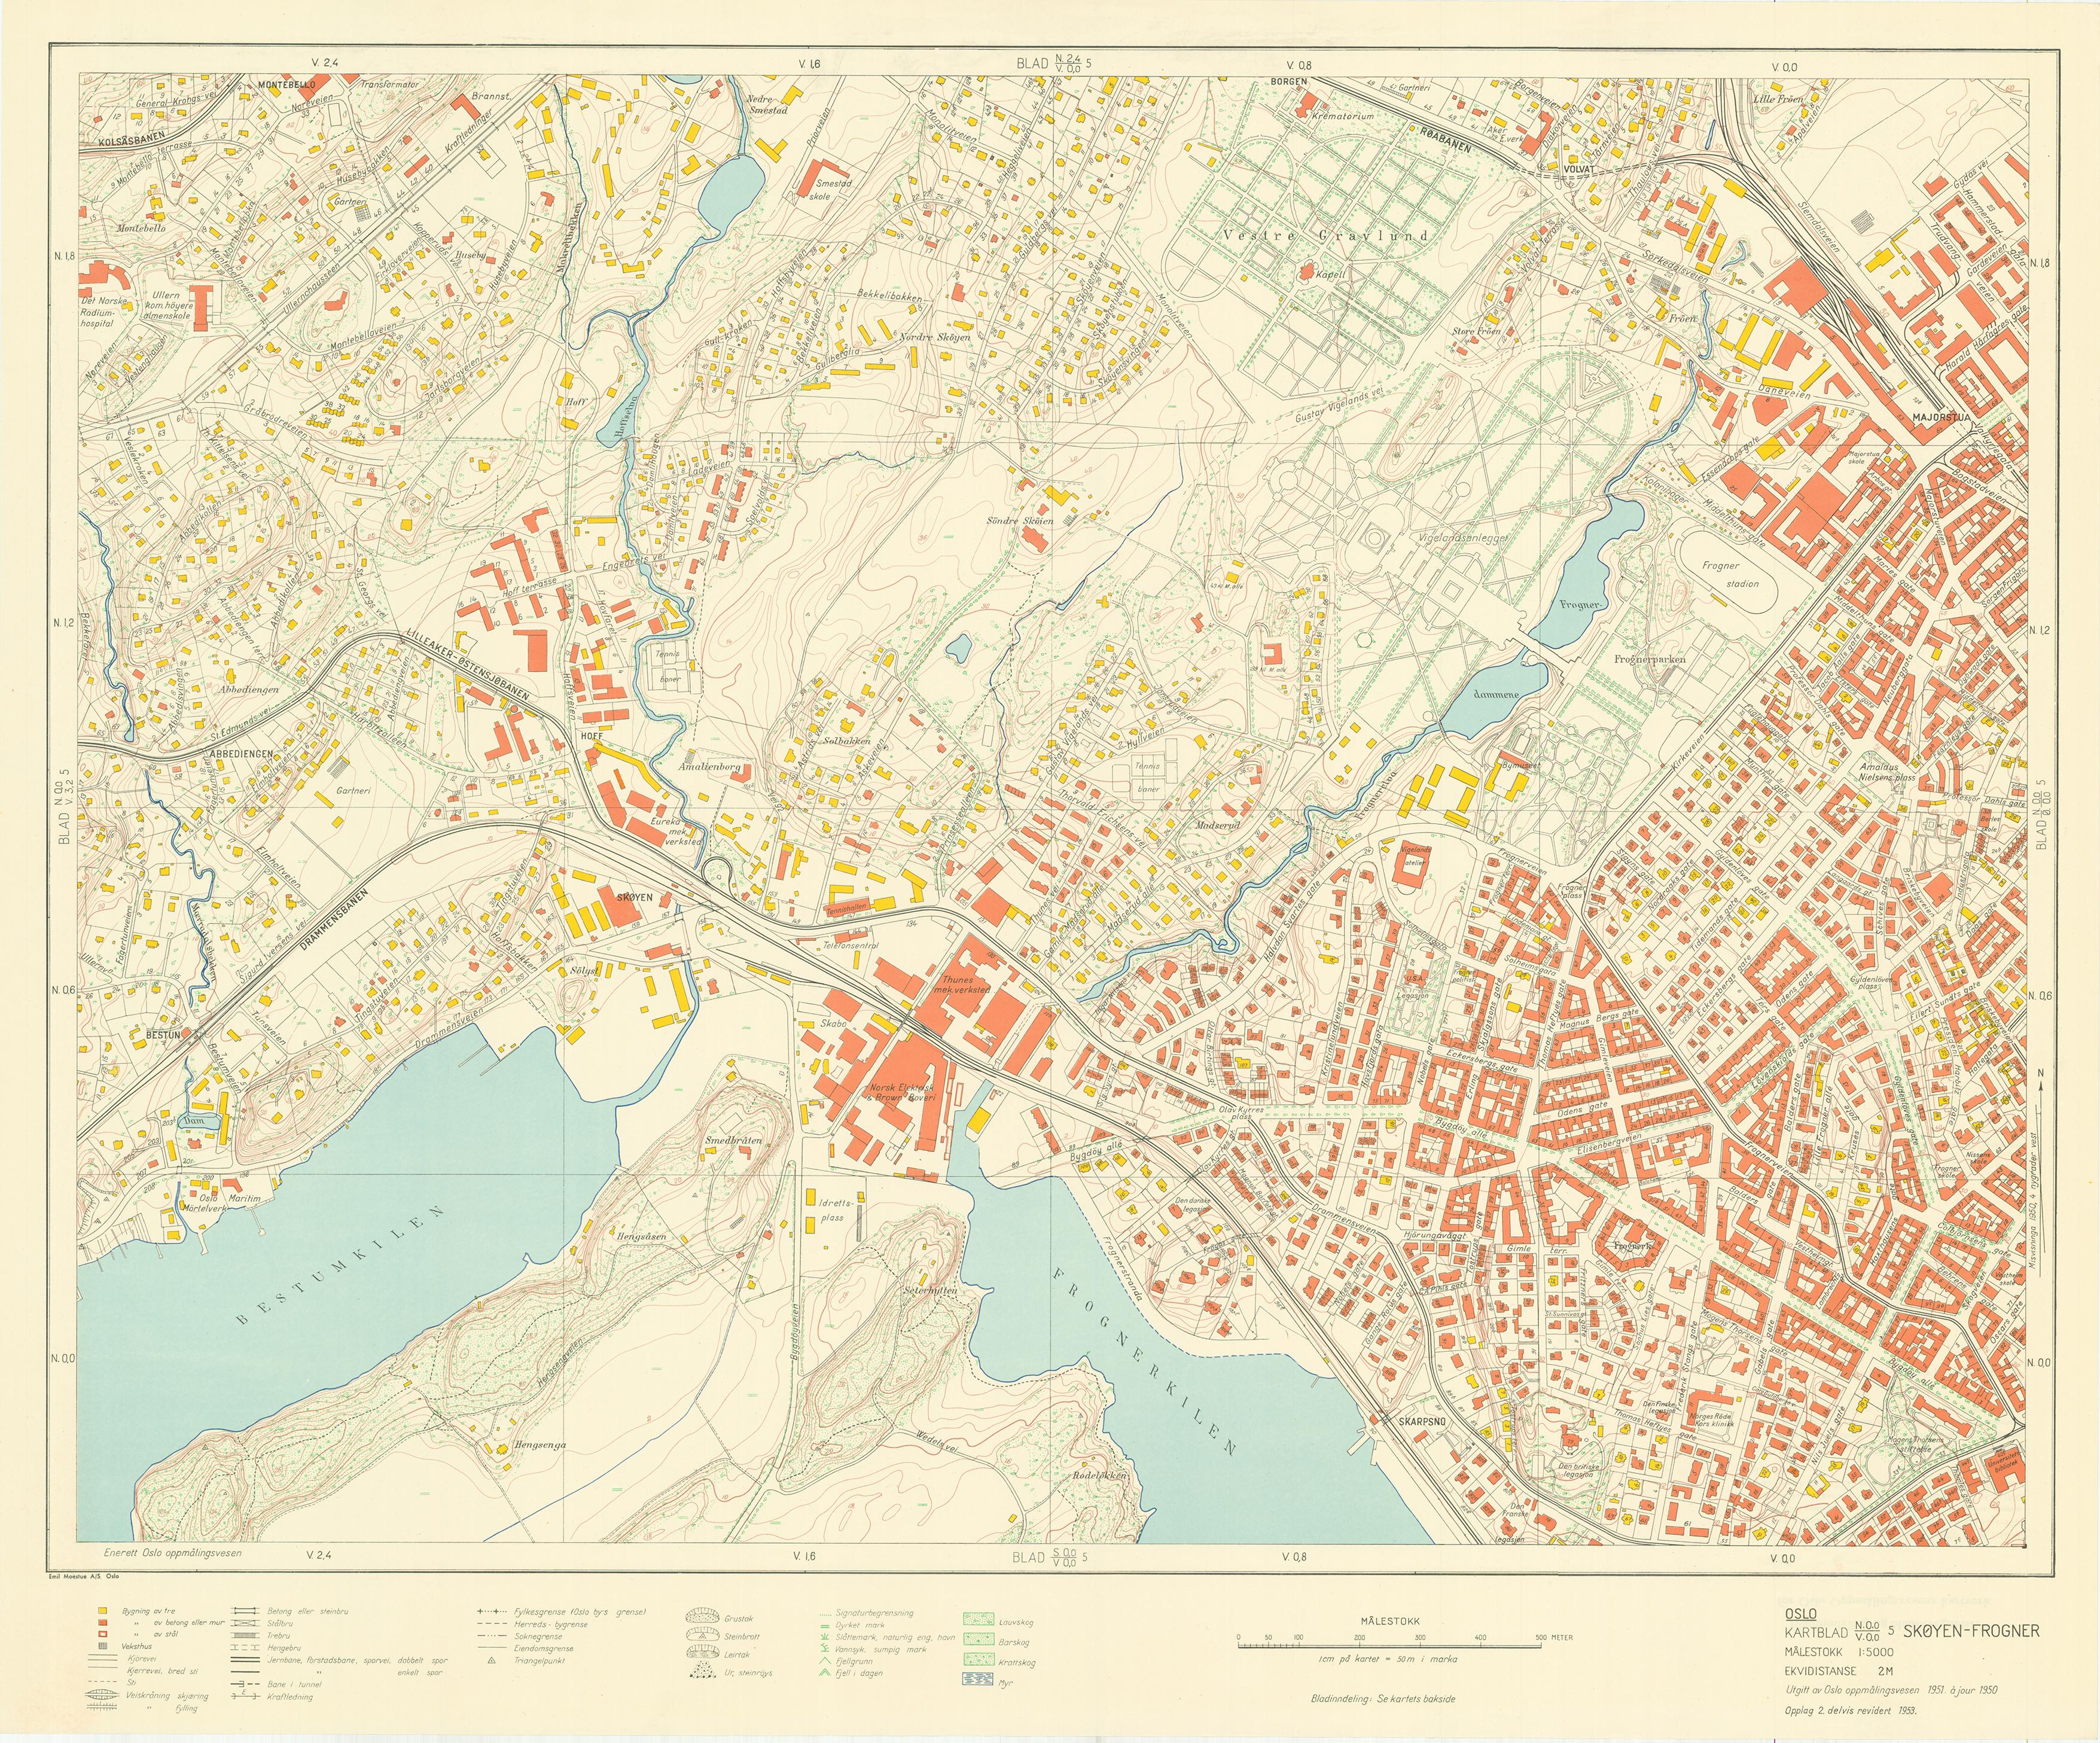 kart skøyen oslo Oslokart 1:5000 1942 1982 kart skøyen oslo